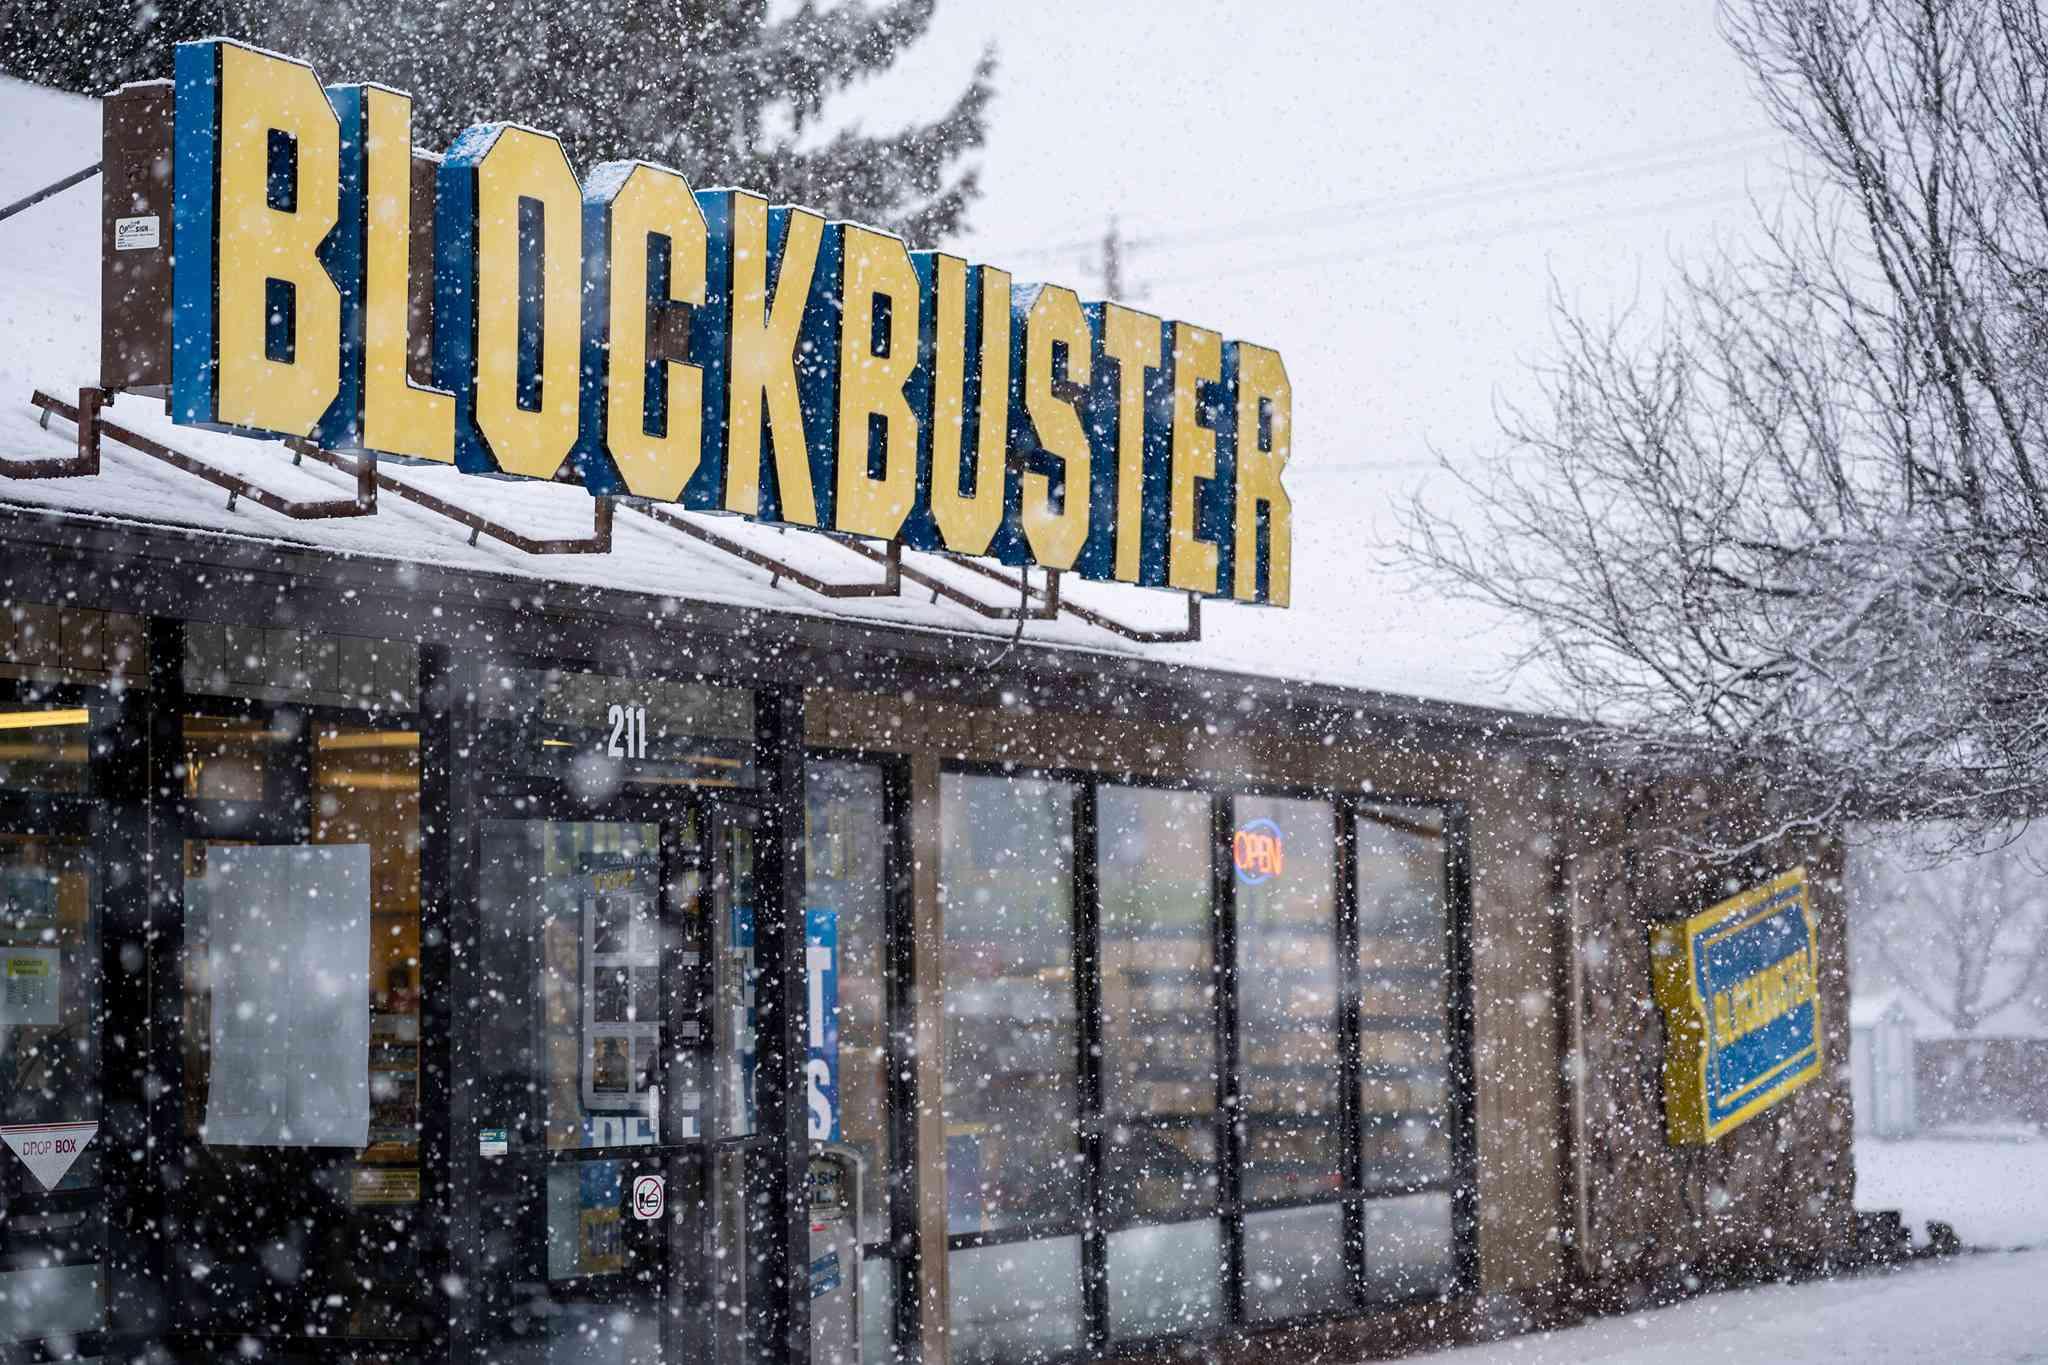 Blockbuster Bend, Oregon